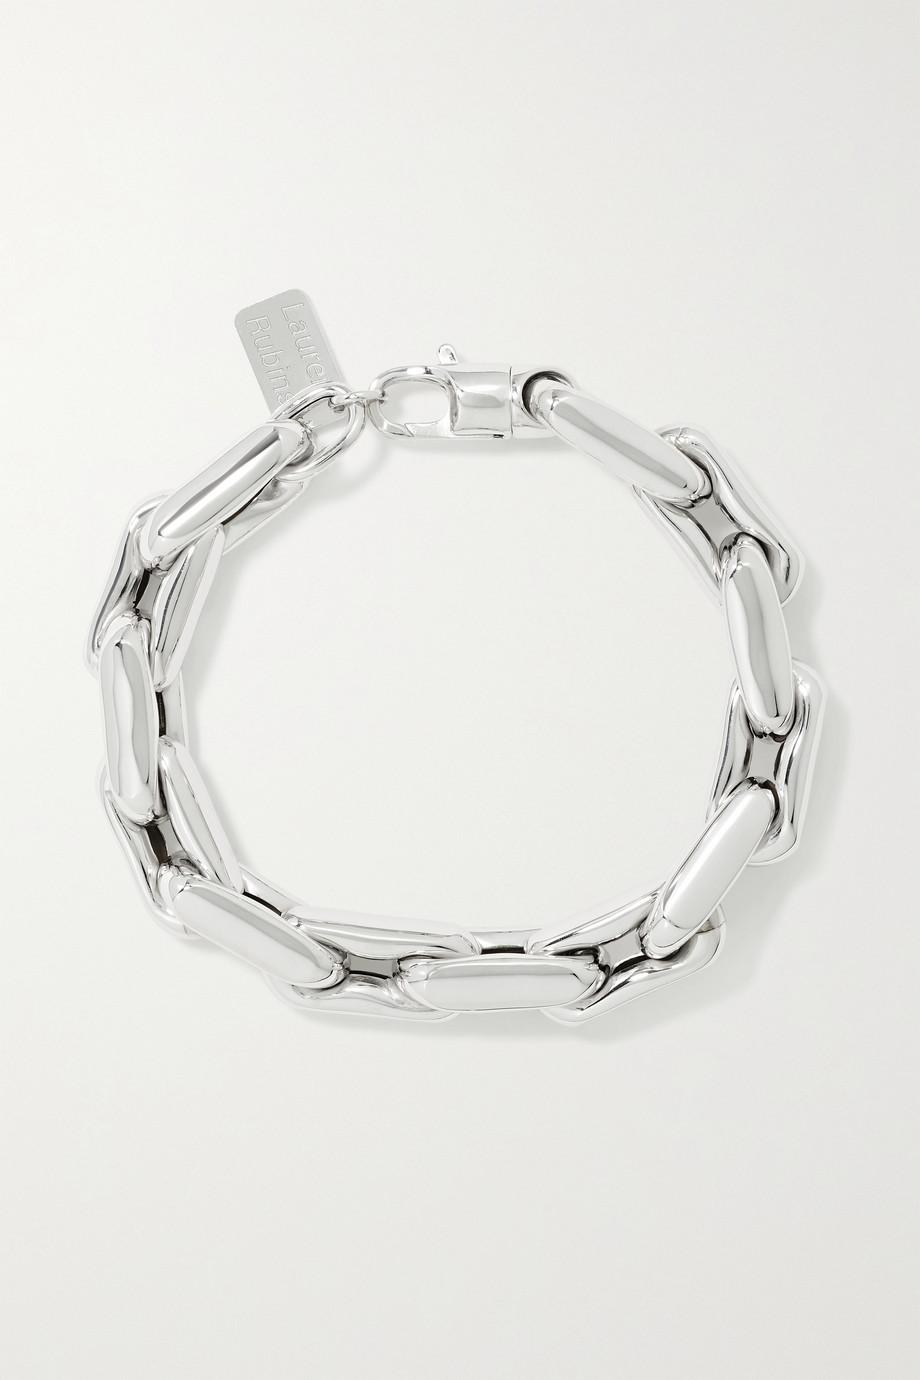 Lauren Rubinski Bracelet en or blanc 14 carats (585/1000) Medium